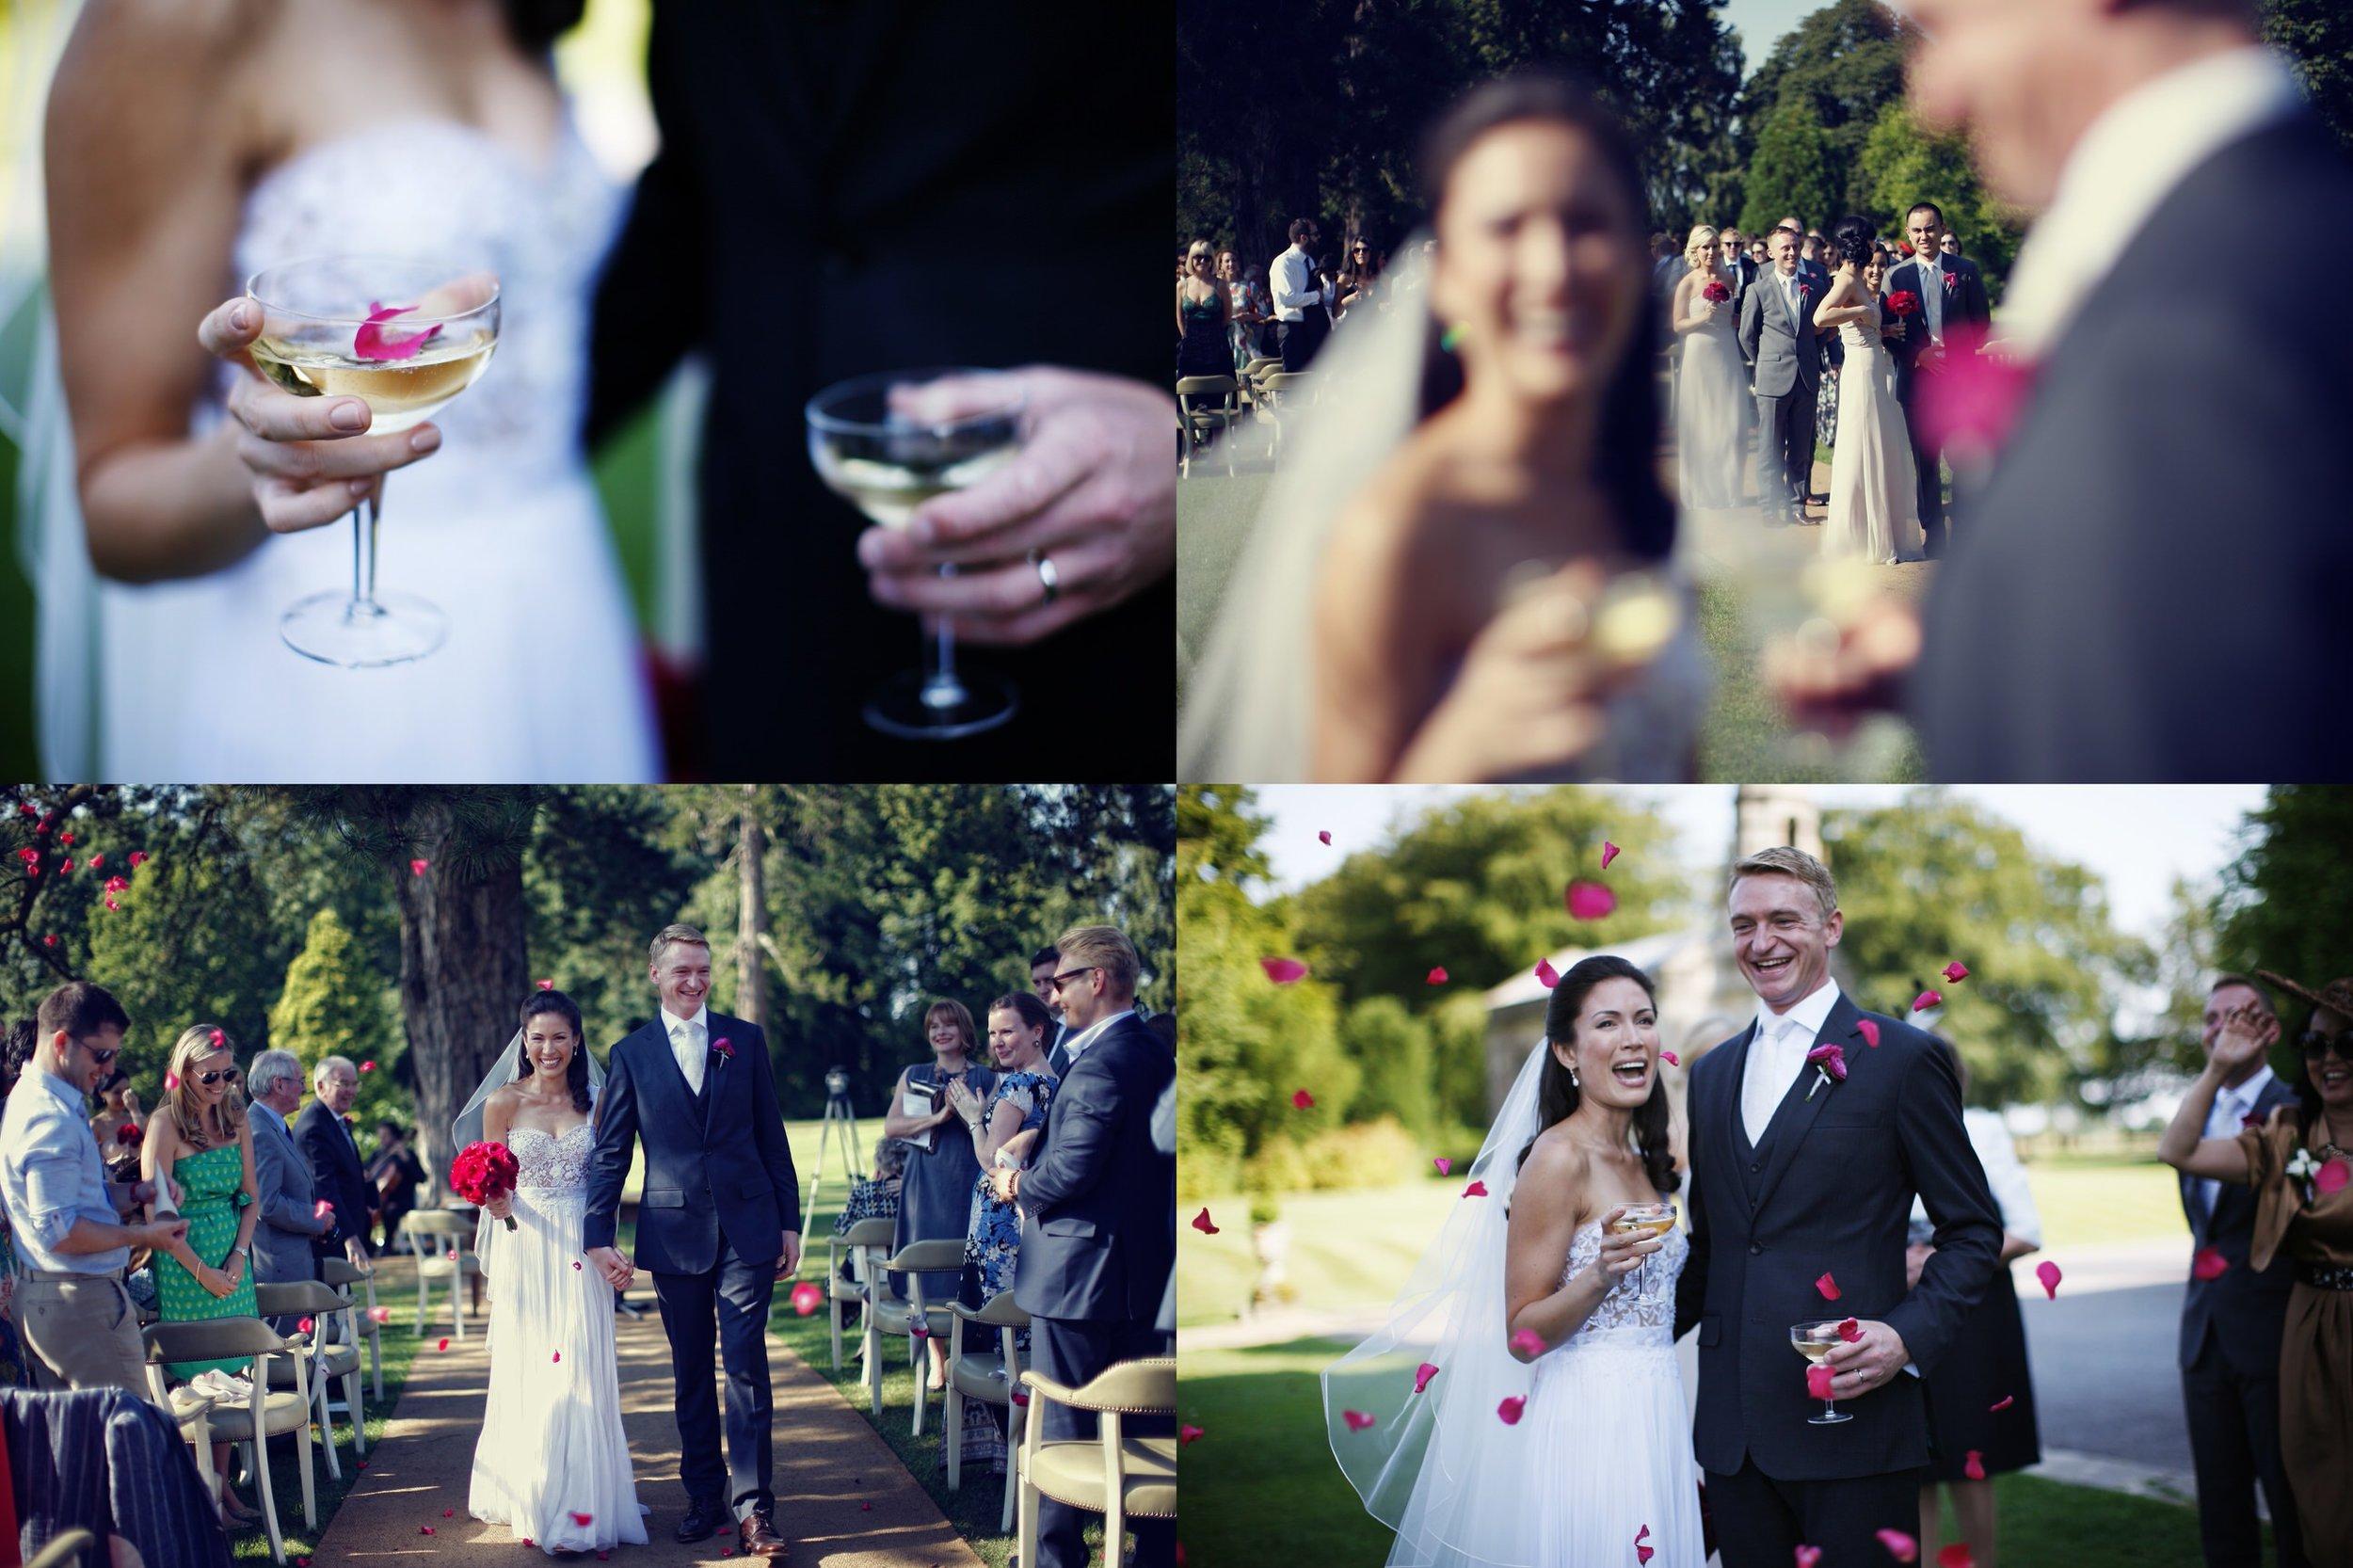 summer-wedding-babington-house-london-weddings_0014.jpg